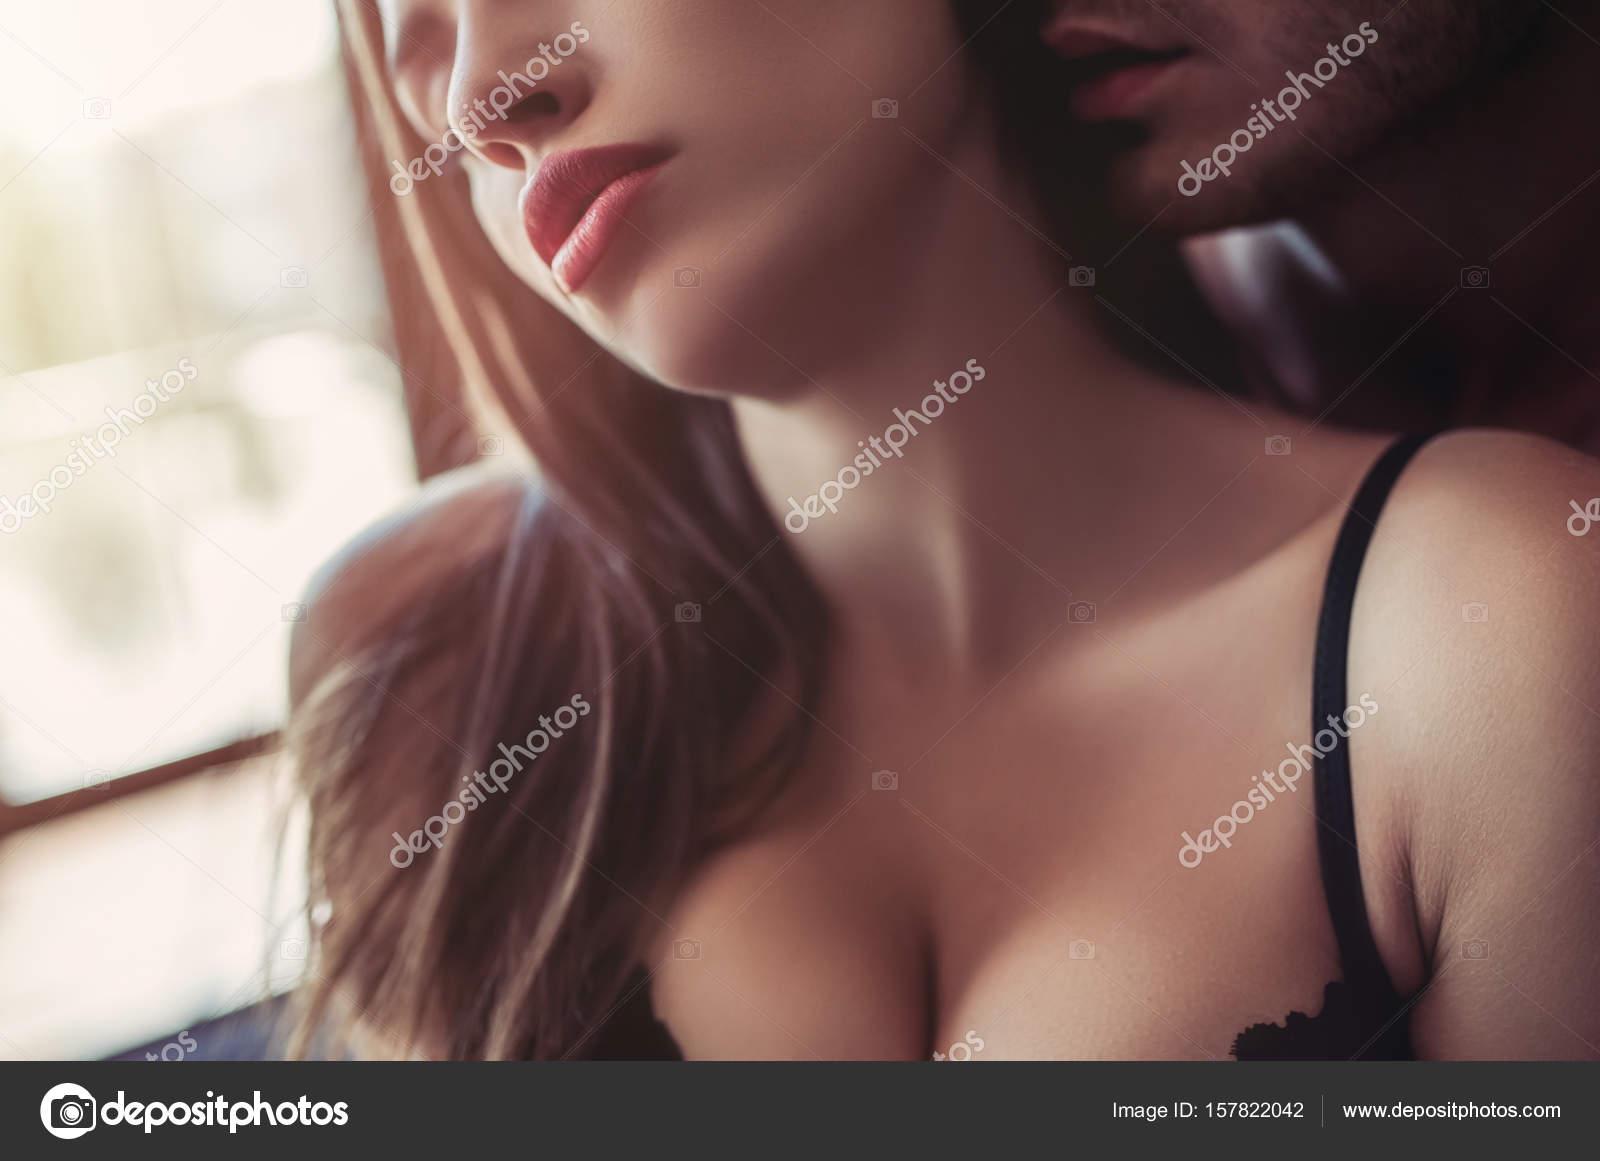 Hot σέξι πορνό κορίτσι φωτογραφία